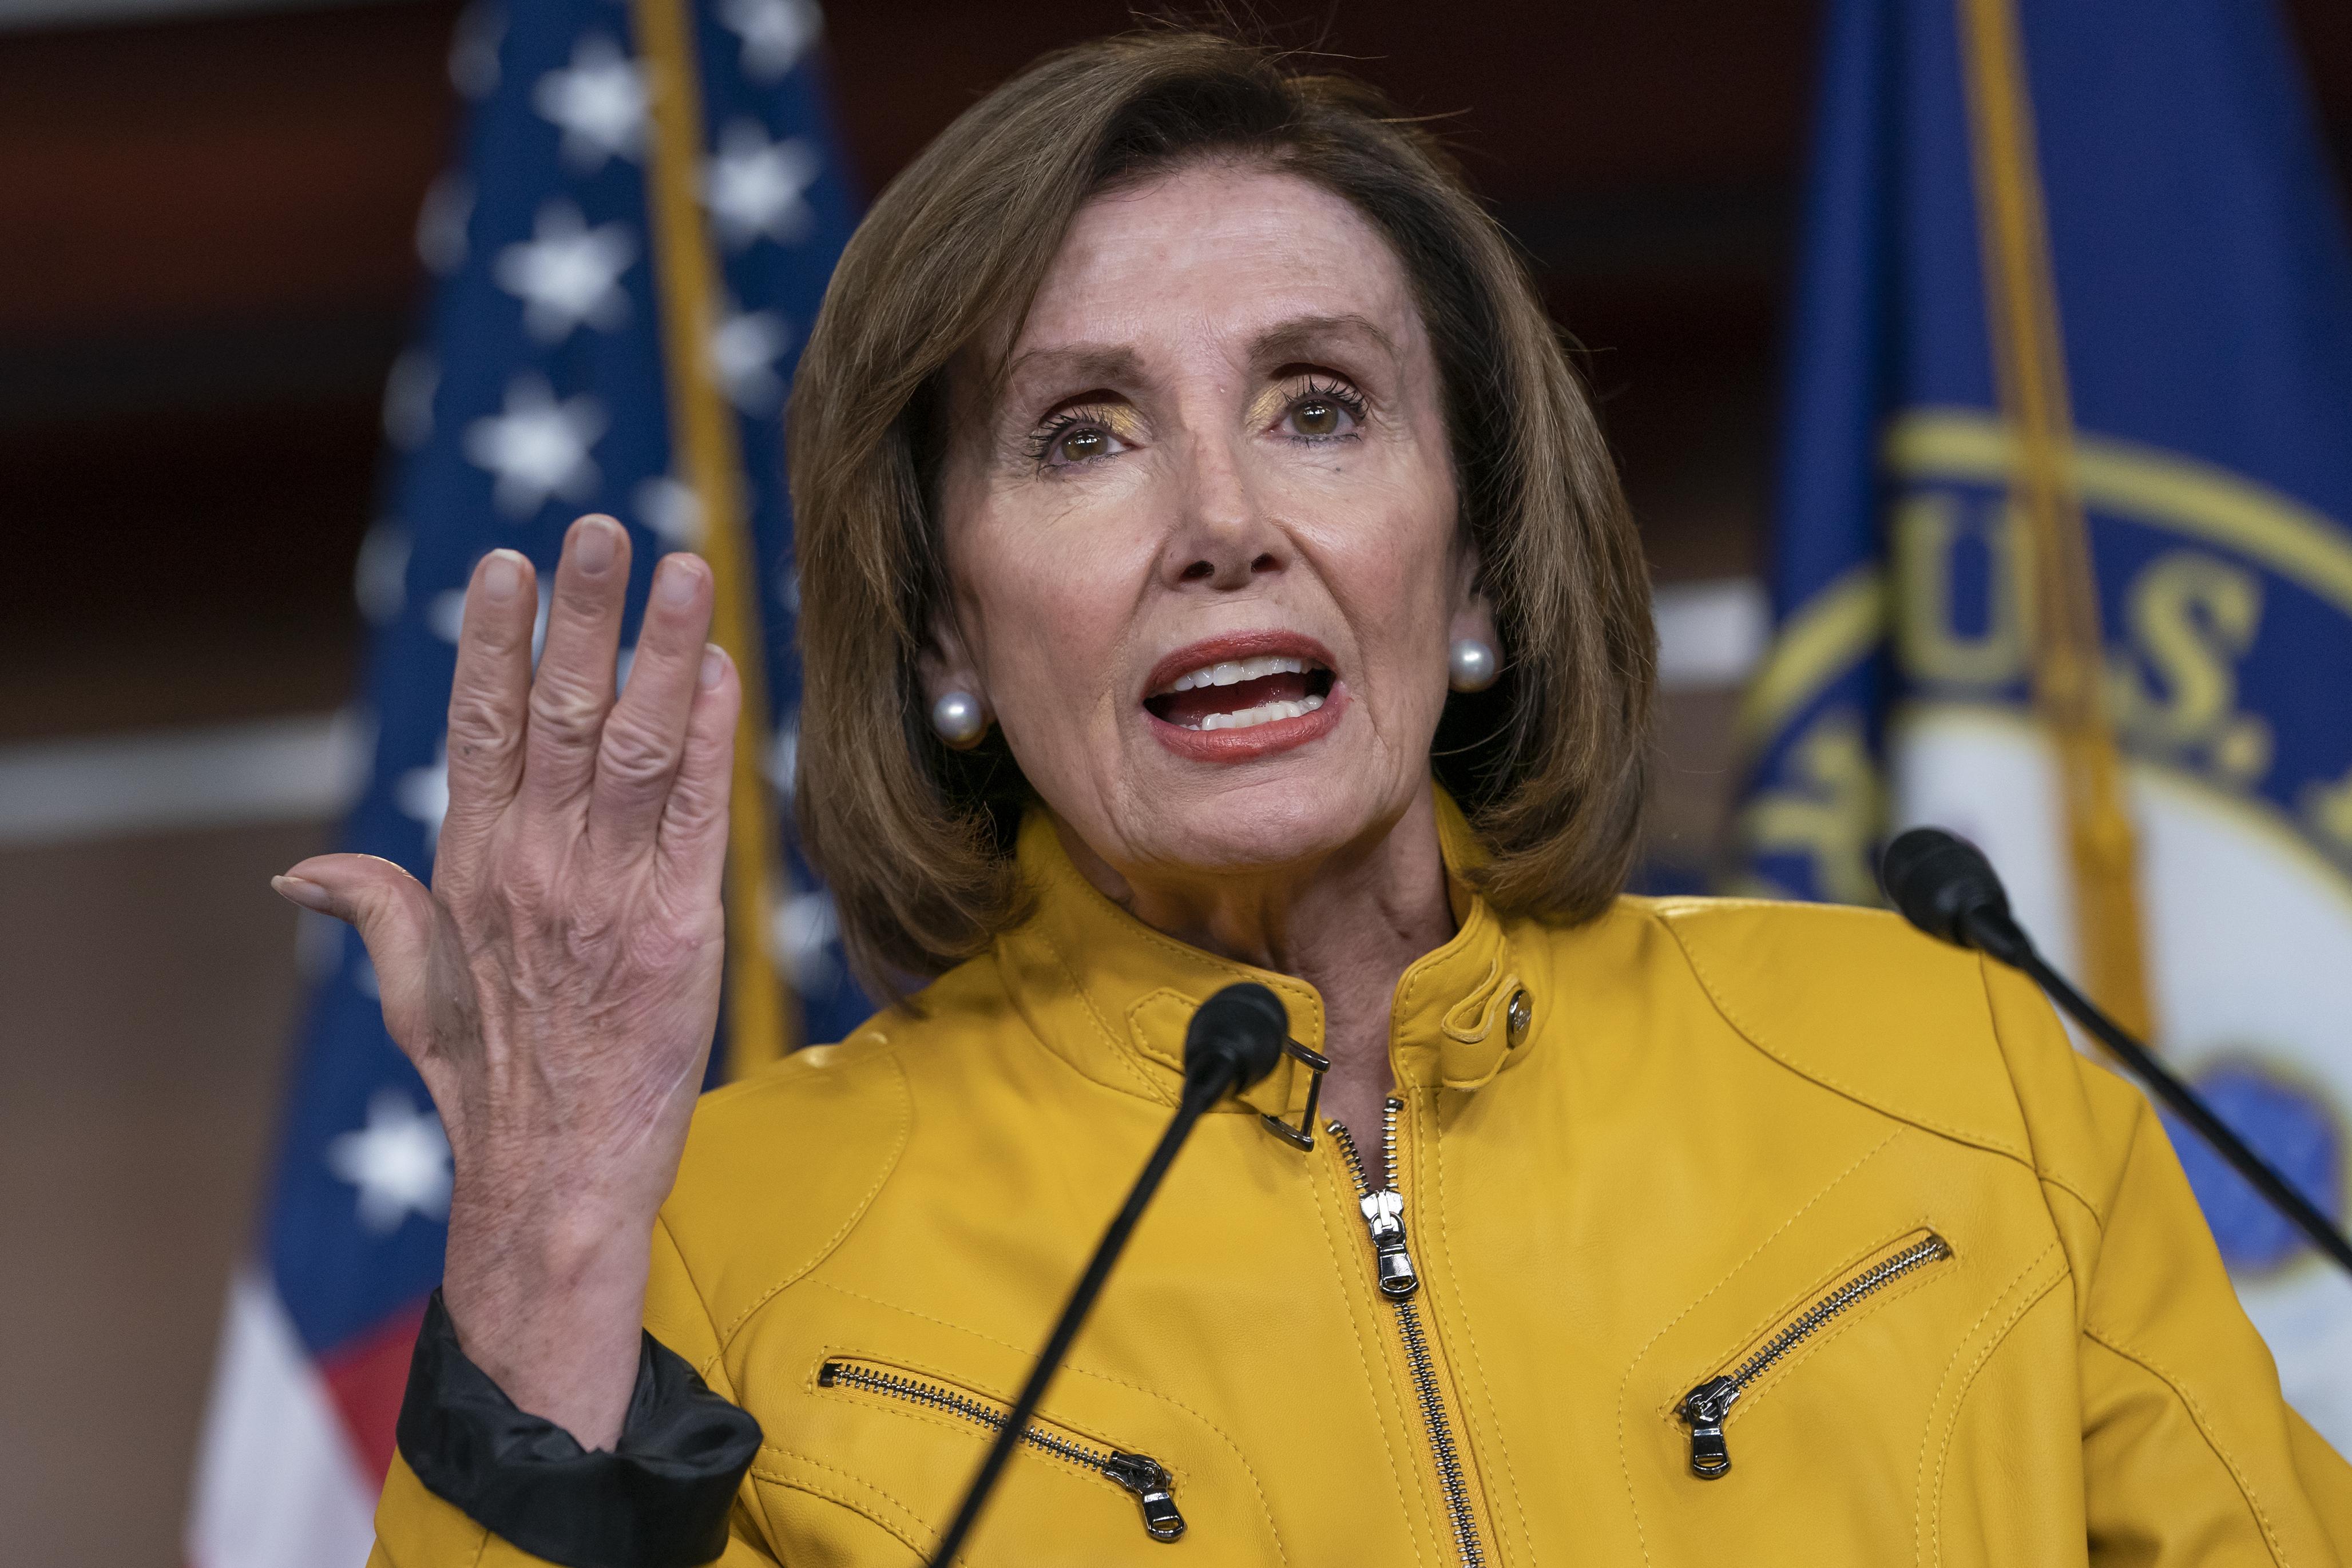 Nancy Pelosi pushes back on impeachment, censure on Trump